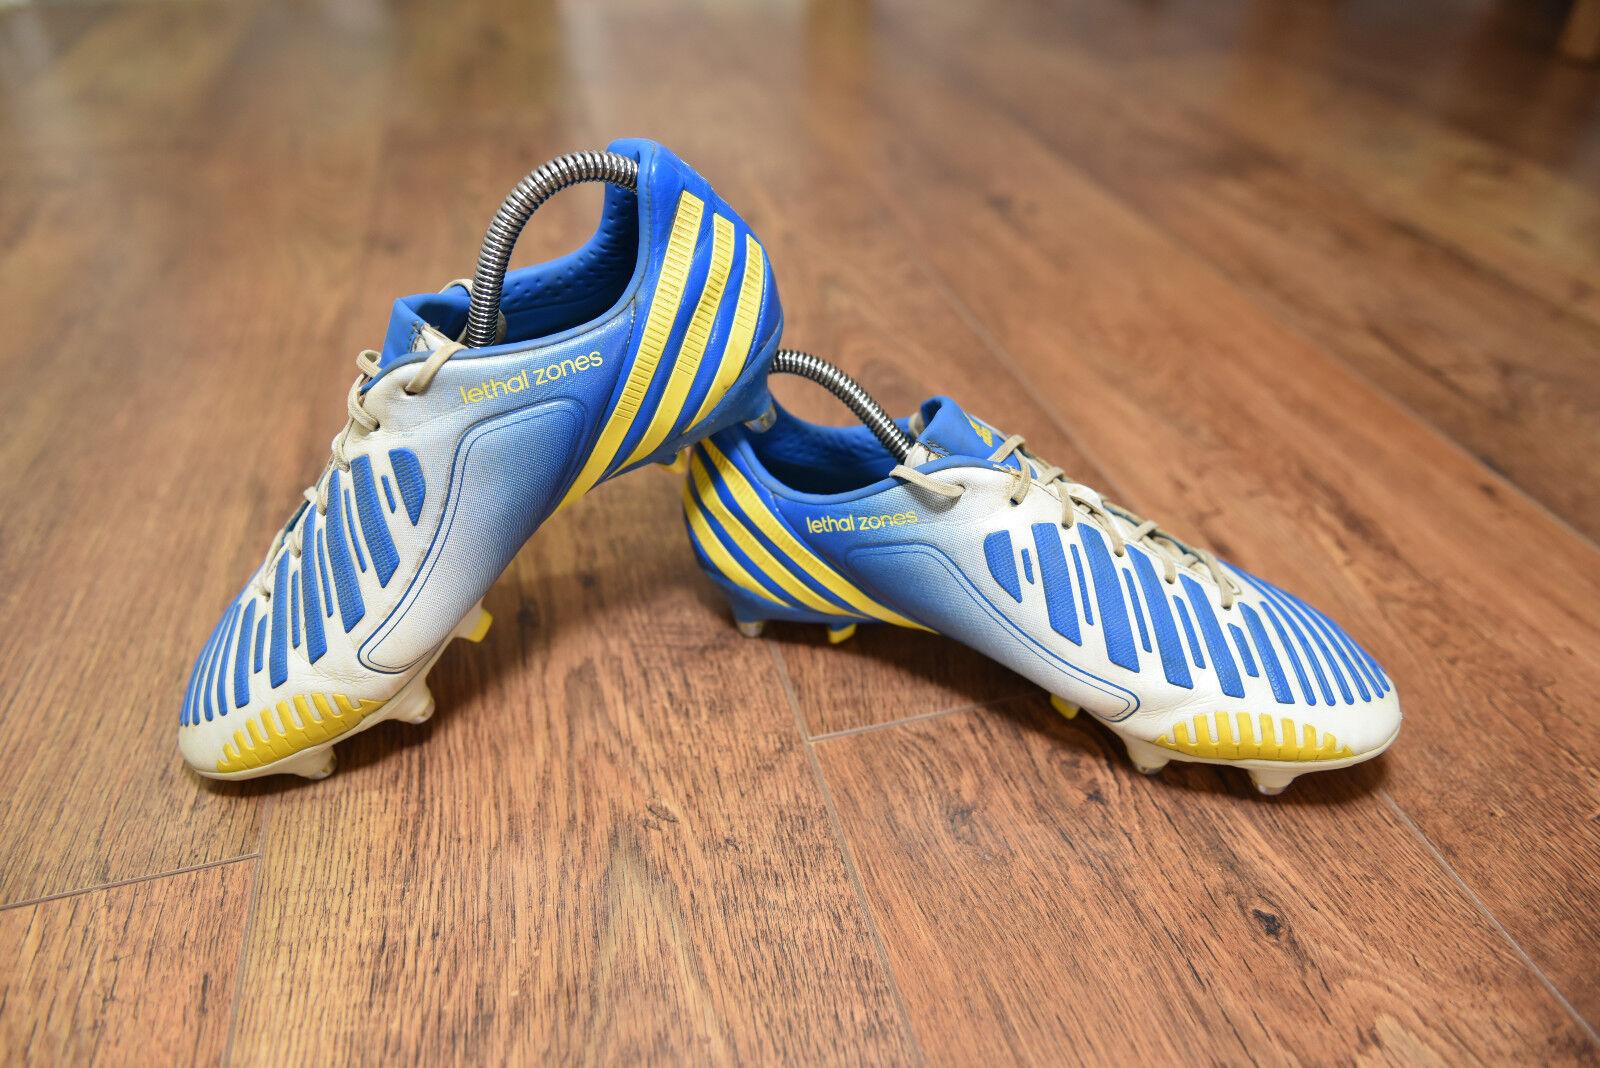 Adidas Predator Lethal Zones SG Football Boots Extralight LZ